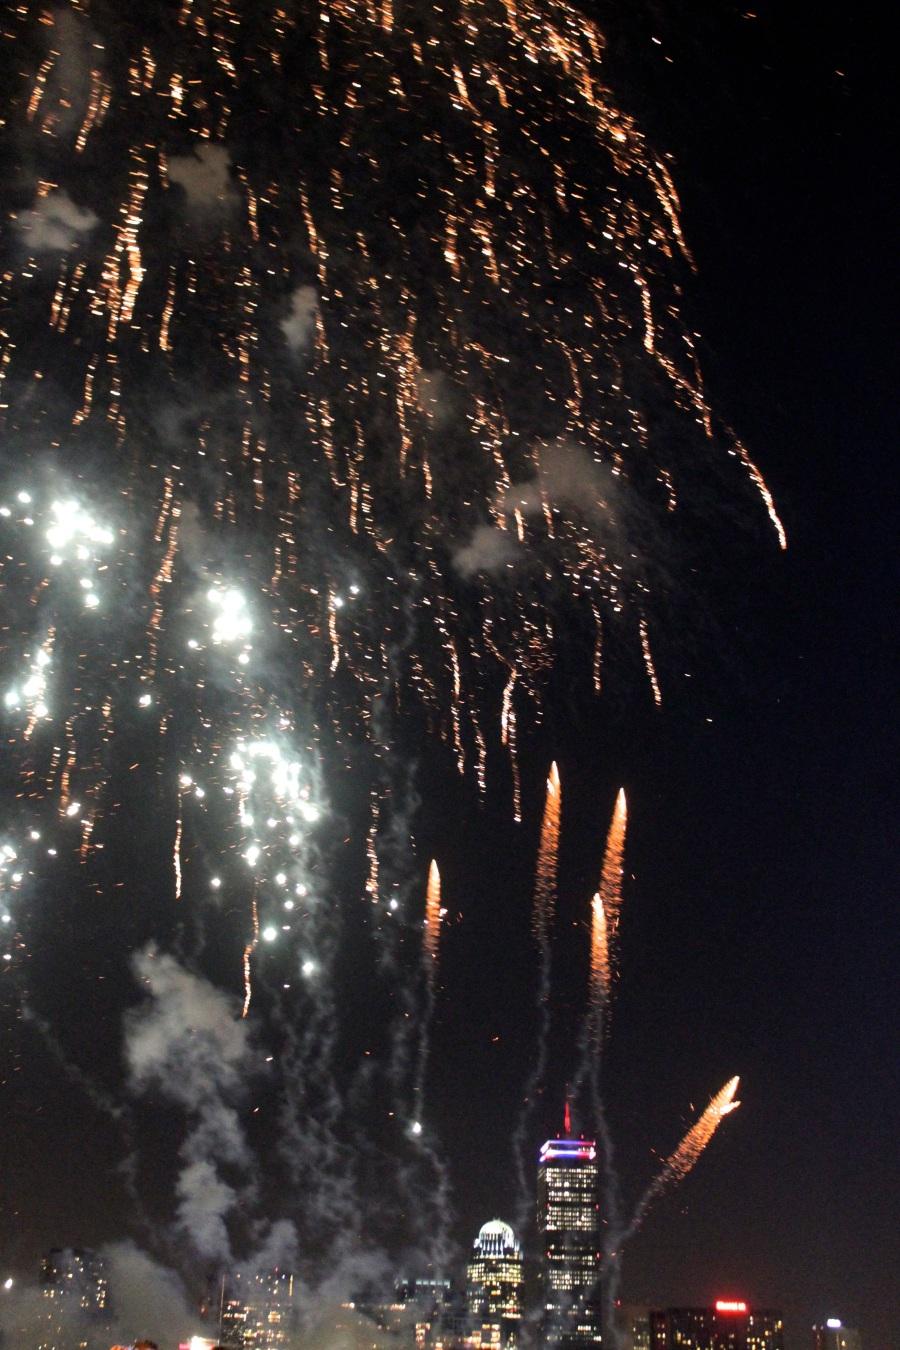 boston july 4 2013 fireworks 20